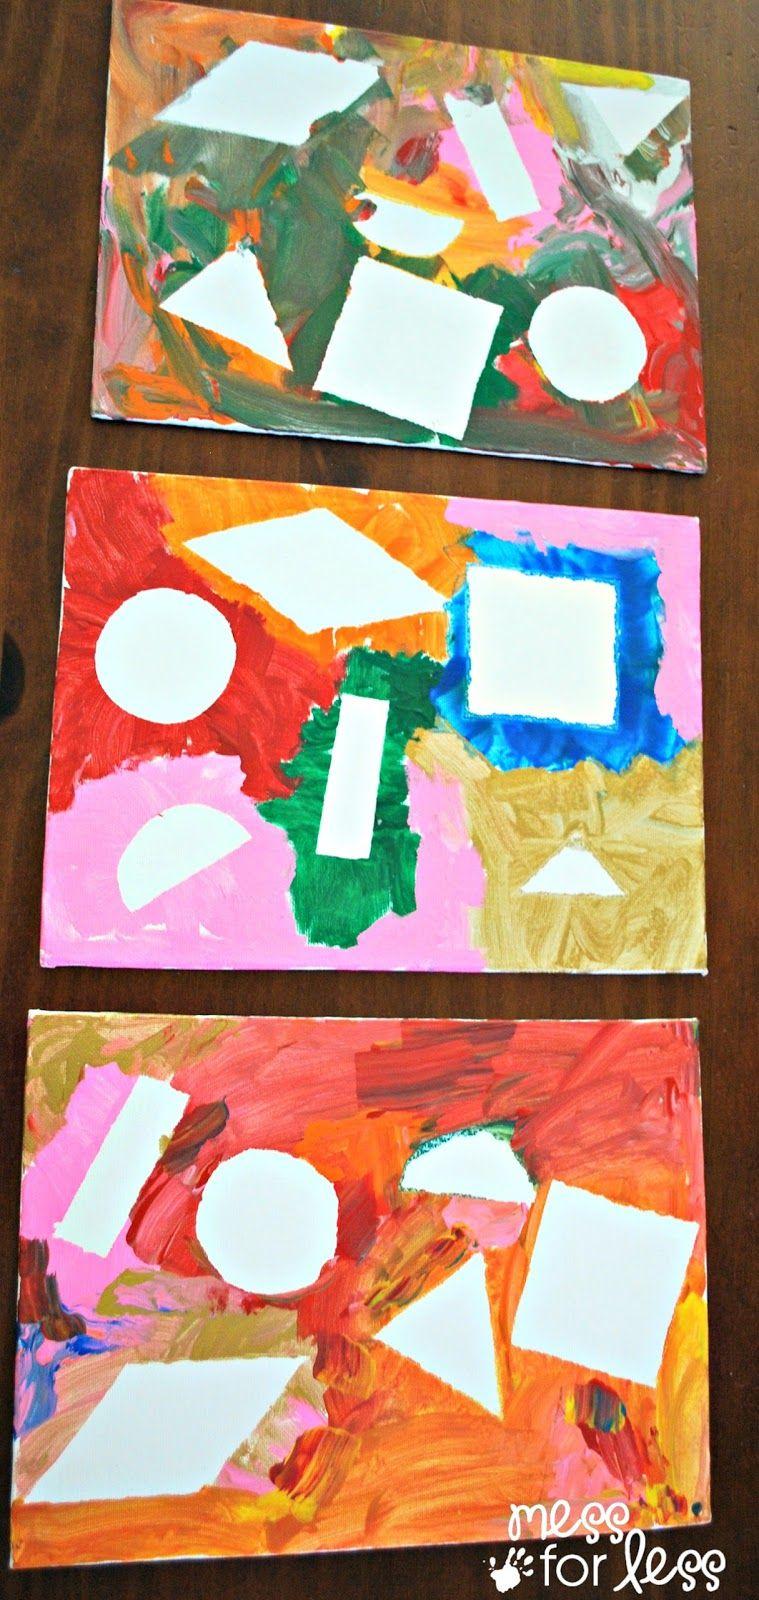 Learning colors art activities for preschool - Contact Paper Shape Art Preschool Shape Activitiespreschool Art Projectspreschool Colorspreschool